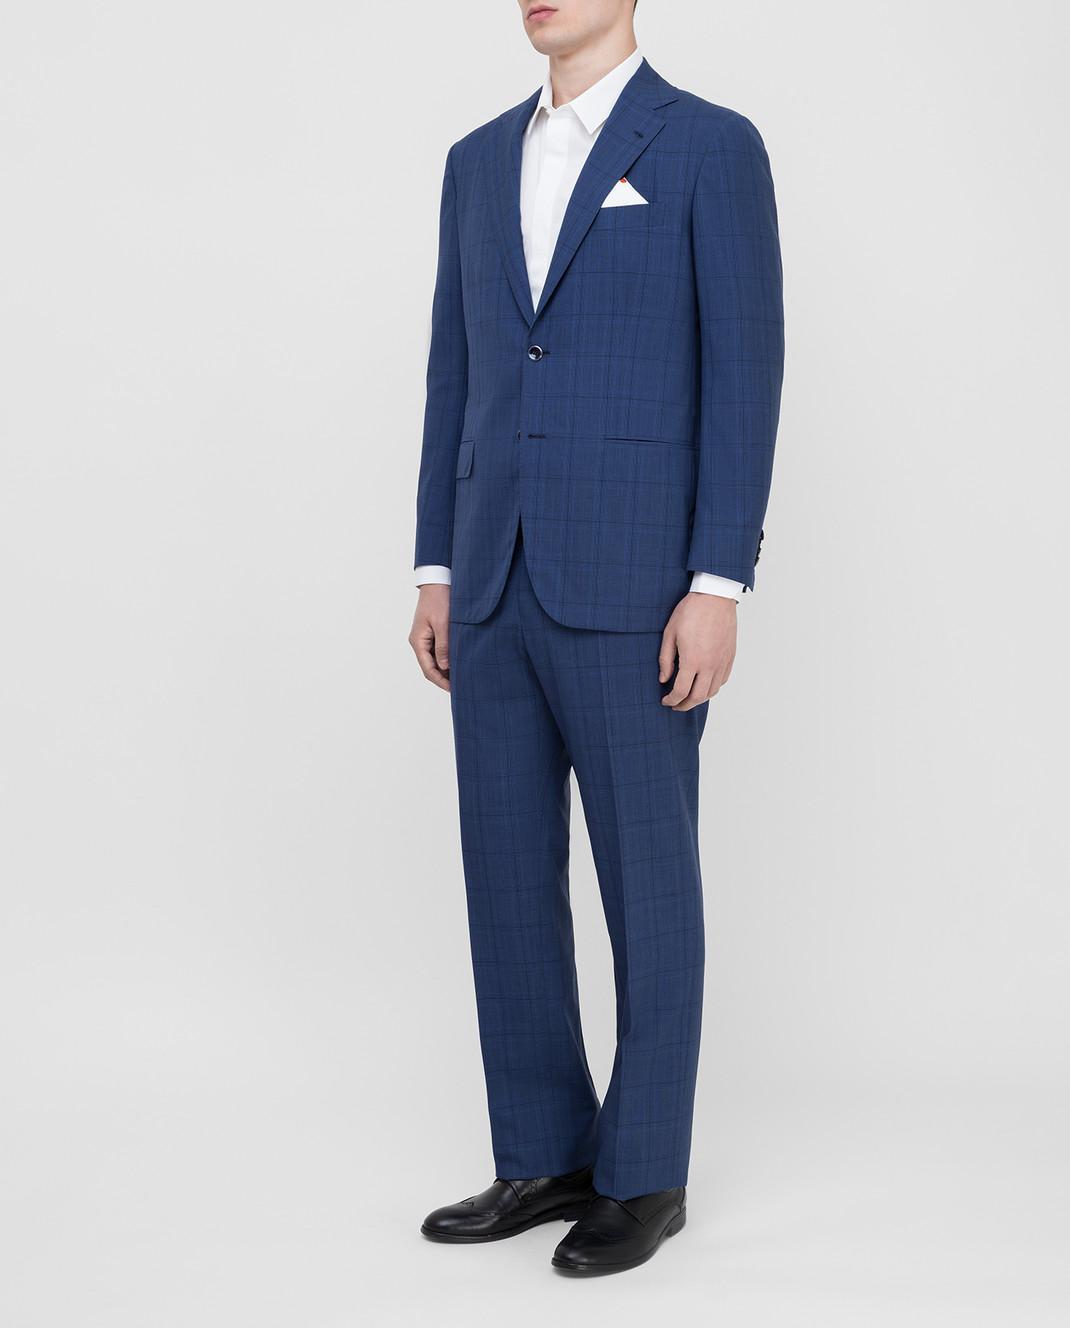 Kiton Темно-синий костюм из шерсти изображение 3